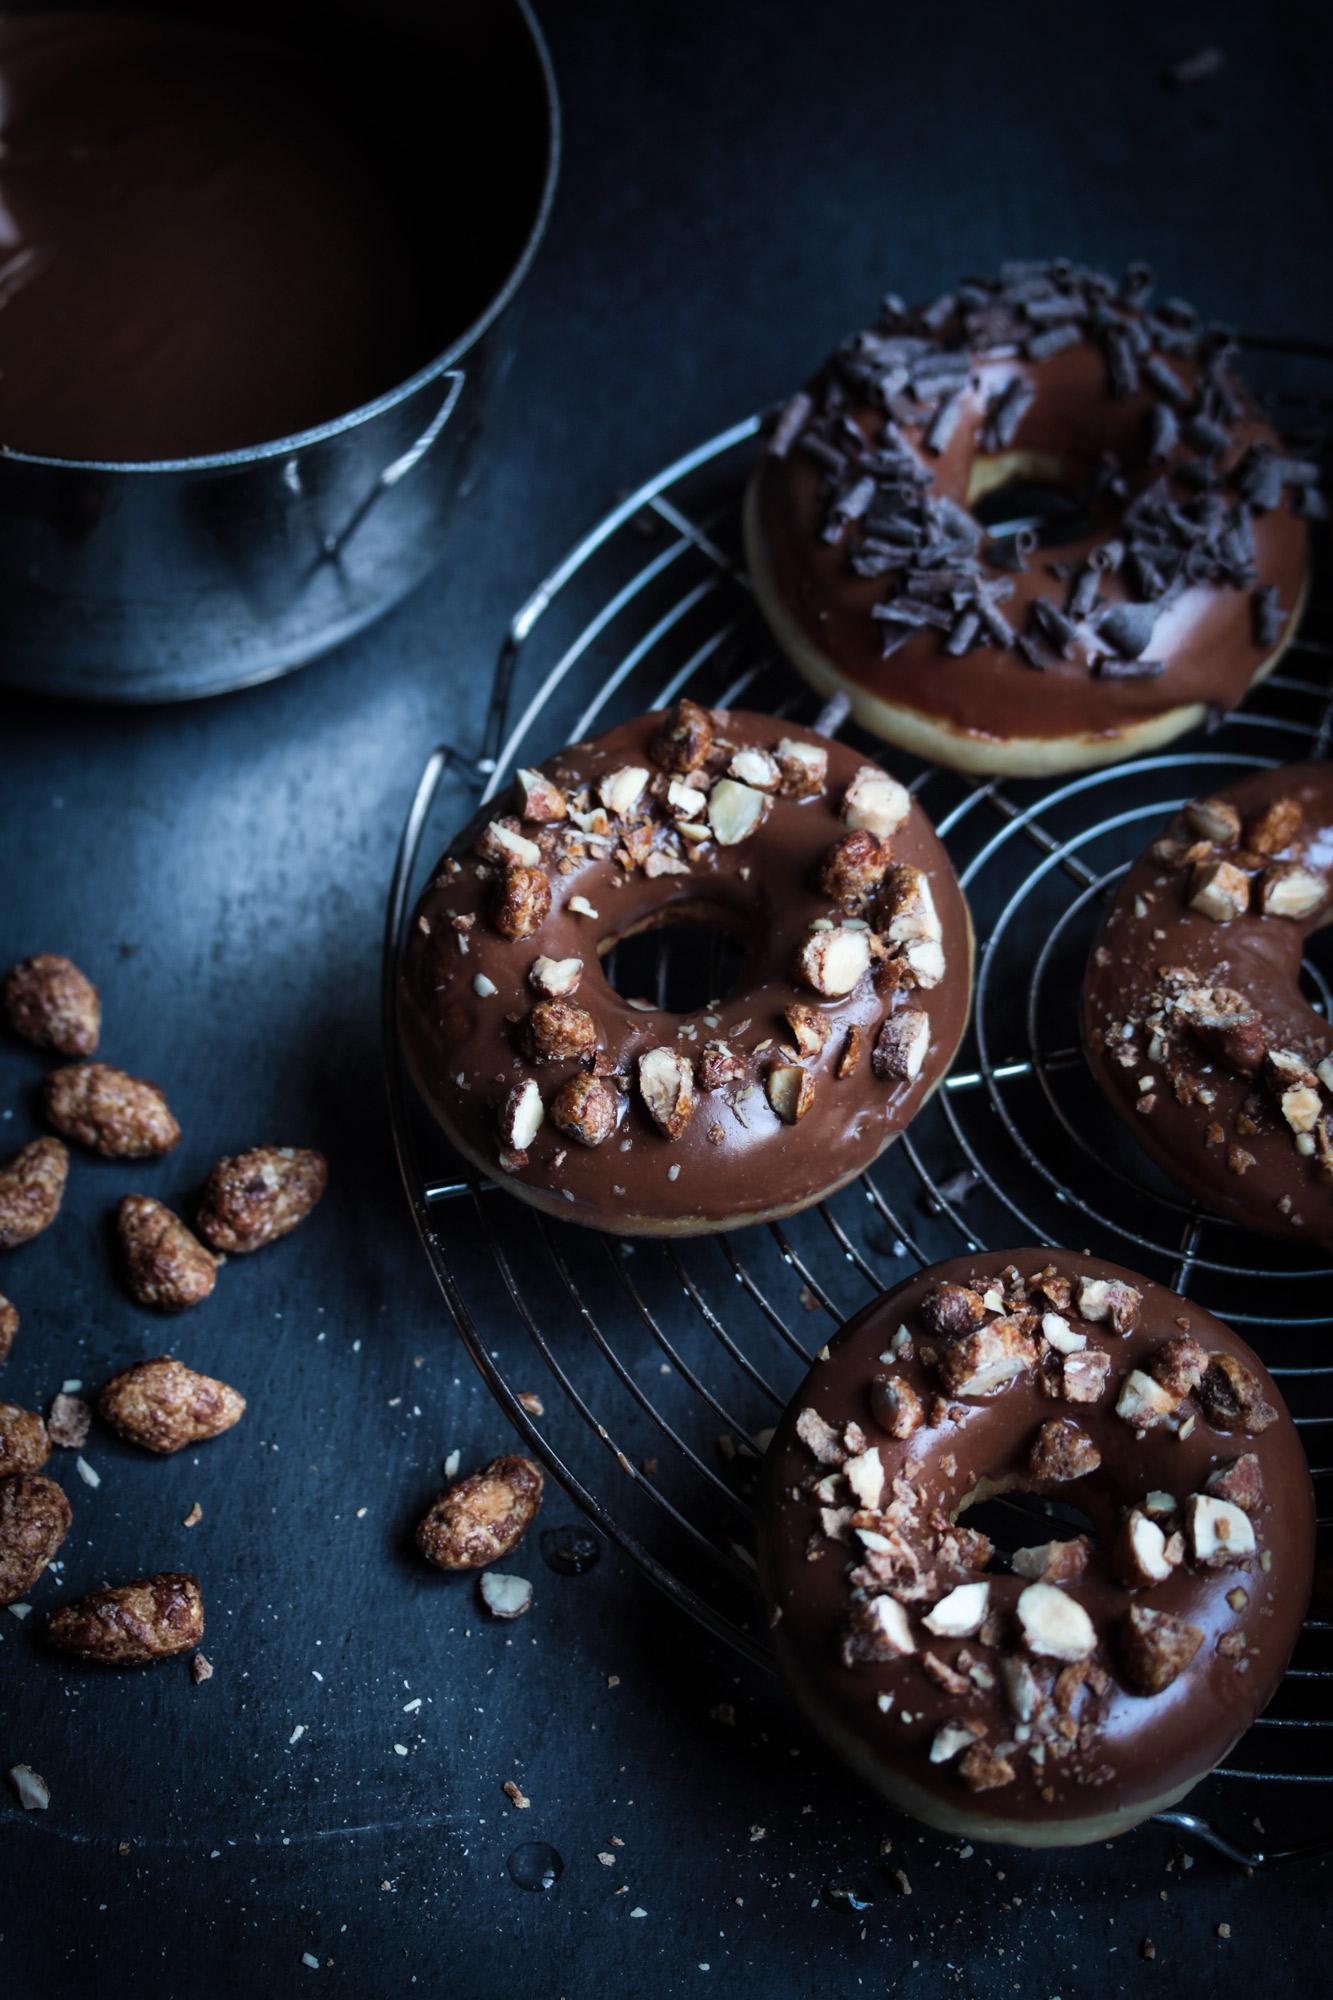 dessert, praliné, pralin , noisette, chocolat, easy, recette, recipe, blogger, chocolate, hazelnut, almond, sweet,chef, blogger, cooking, cake , leger , gateau , light, chabath , shabath , parvé, dairyfree, sans lactoses , bread, homemade, freshly baked, recipe, pain , pain de mie, loaf, MAP, recette, blog, blogger, donut, beignet, hannouca, doughnut, hanouka, sucre, doughnut, donkindonu, donut,